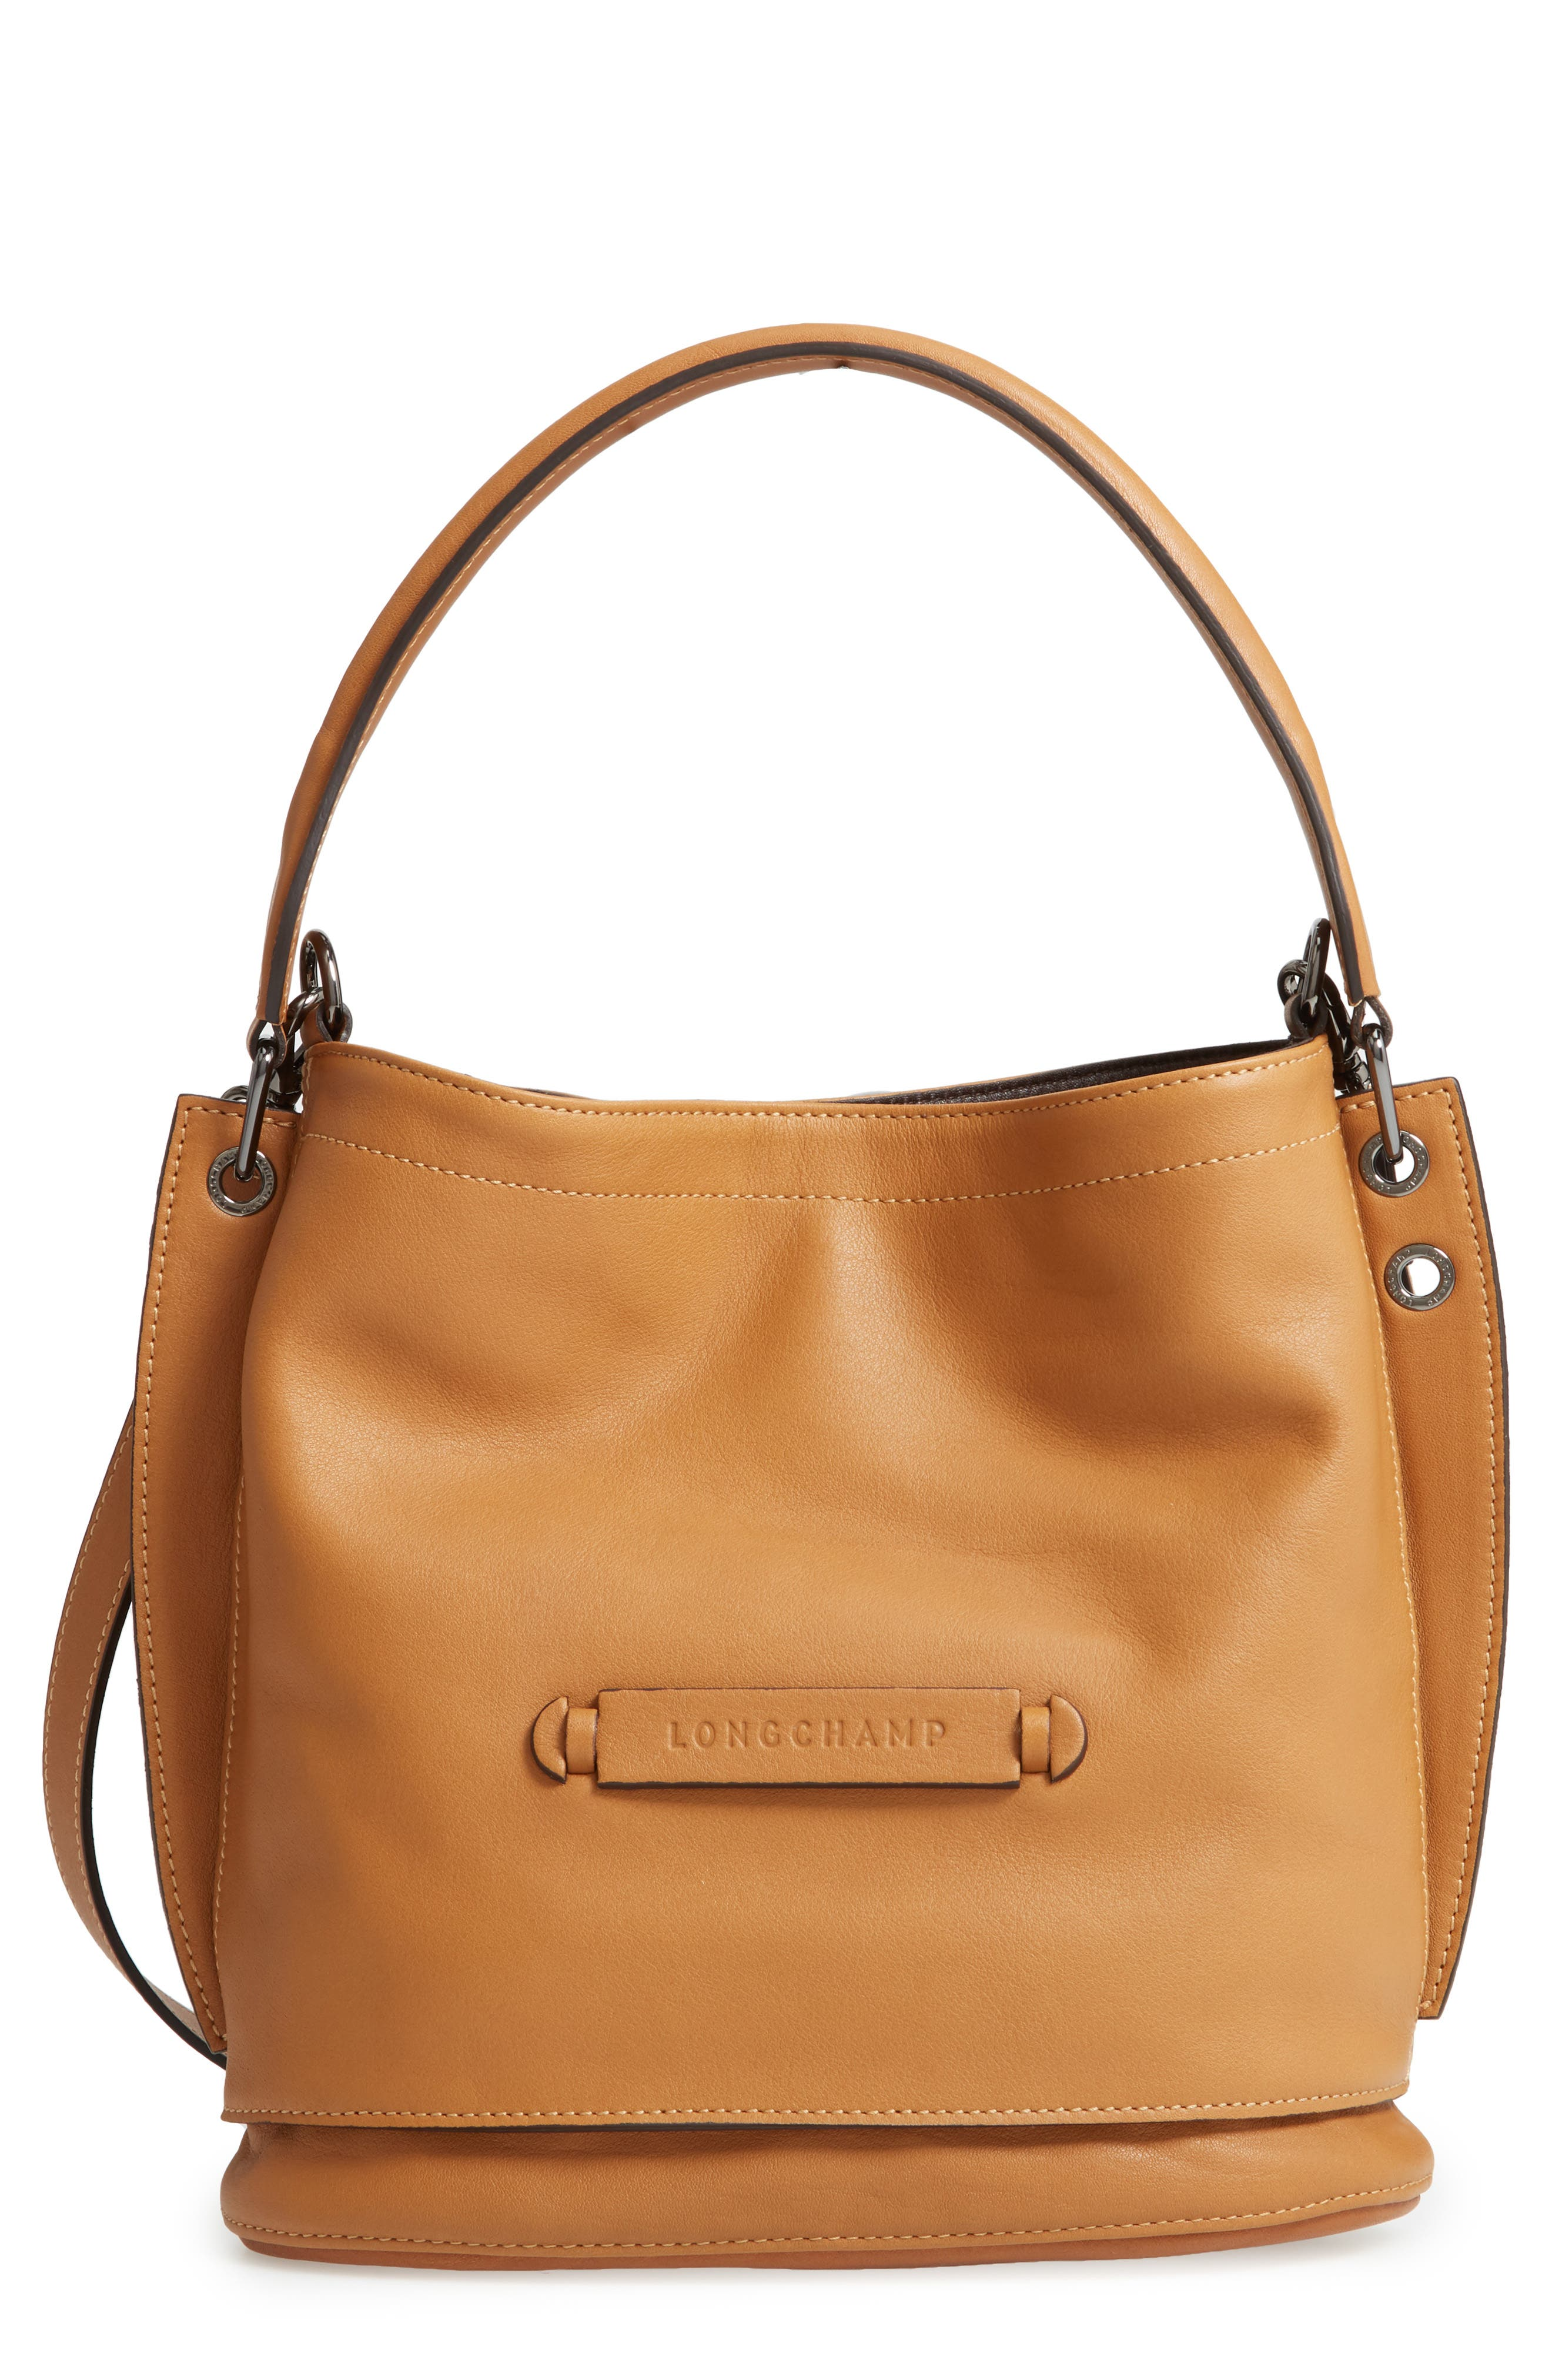 3D Leather Bucket Bag,                             Main thumbnail 1, color,                             NATURAL